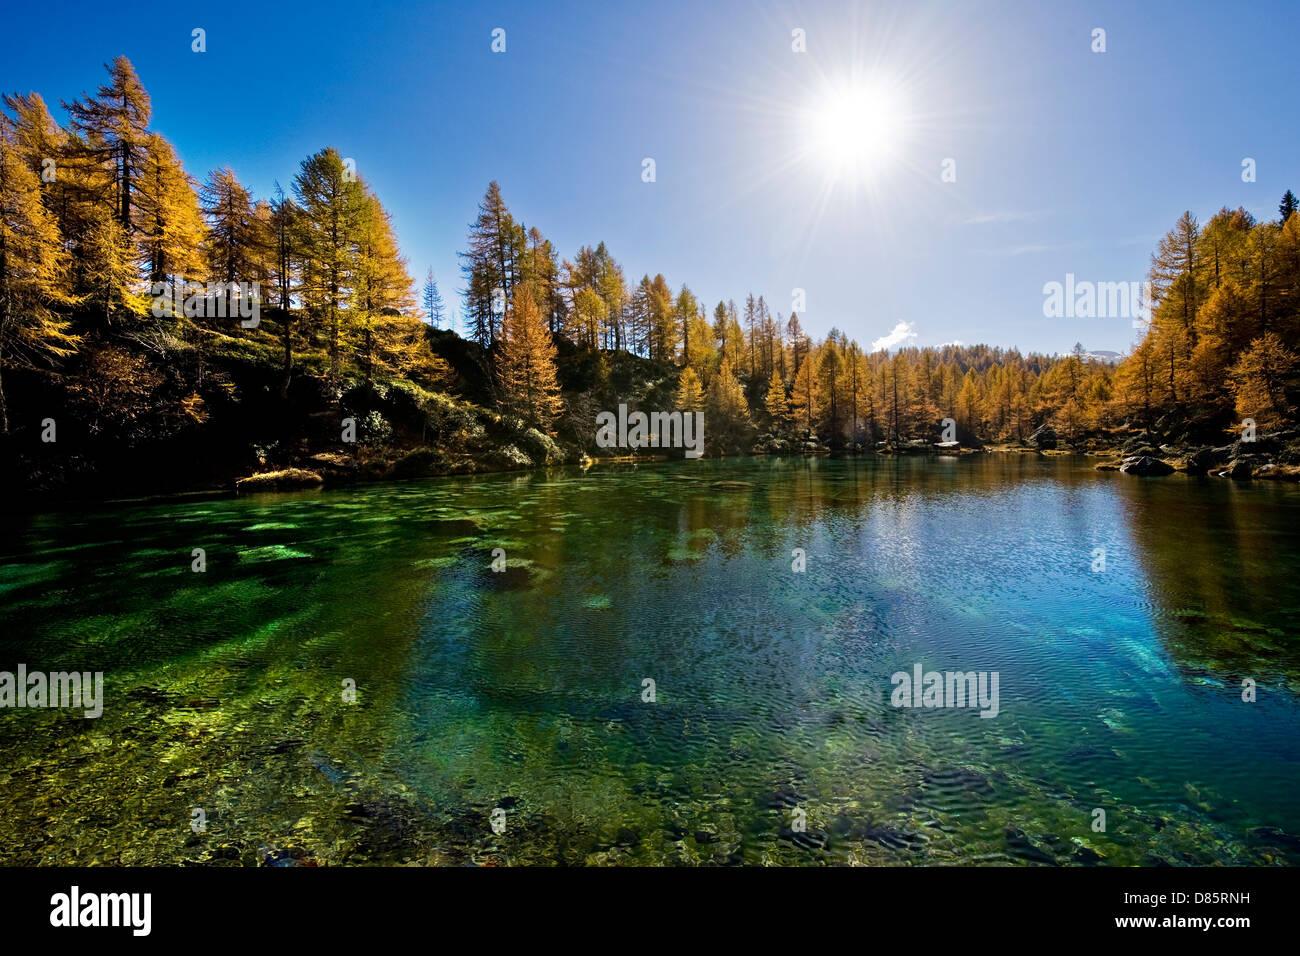 Italy Piedmont Devero alp Alpe Devero Lake of Shadows or blue lake - Stock Image